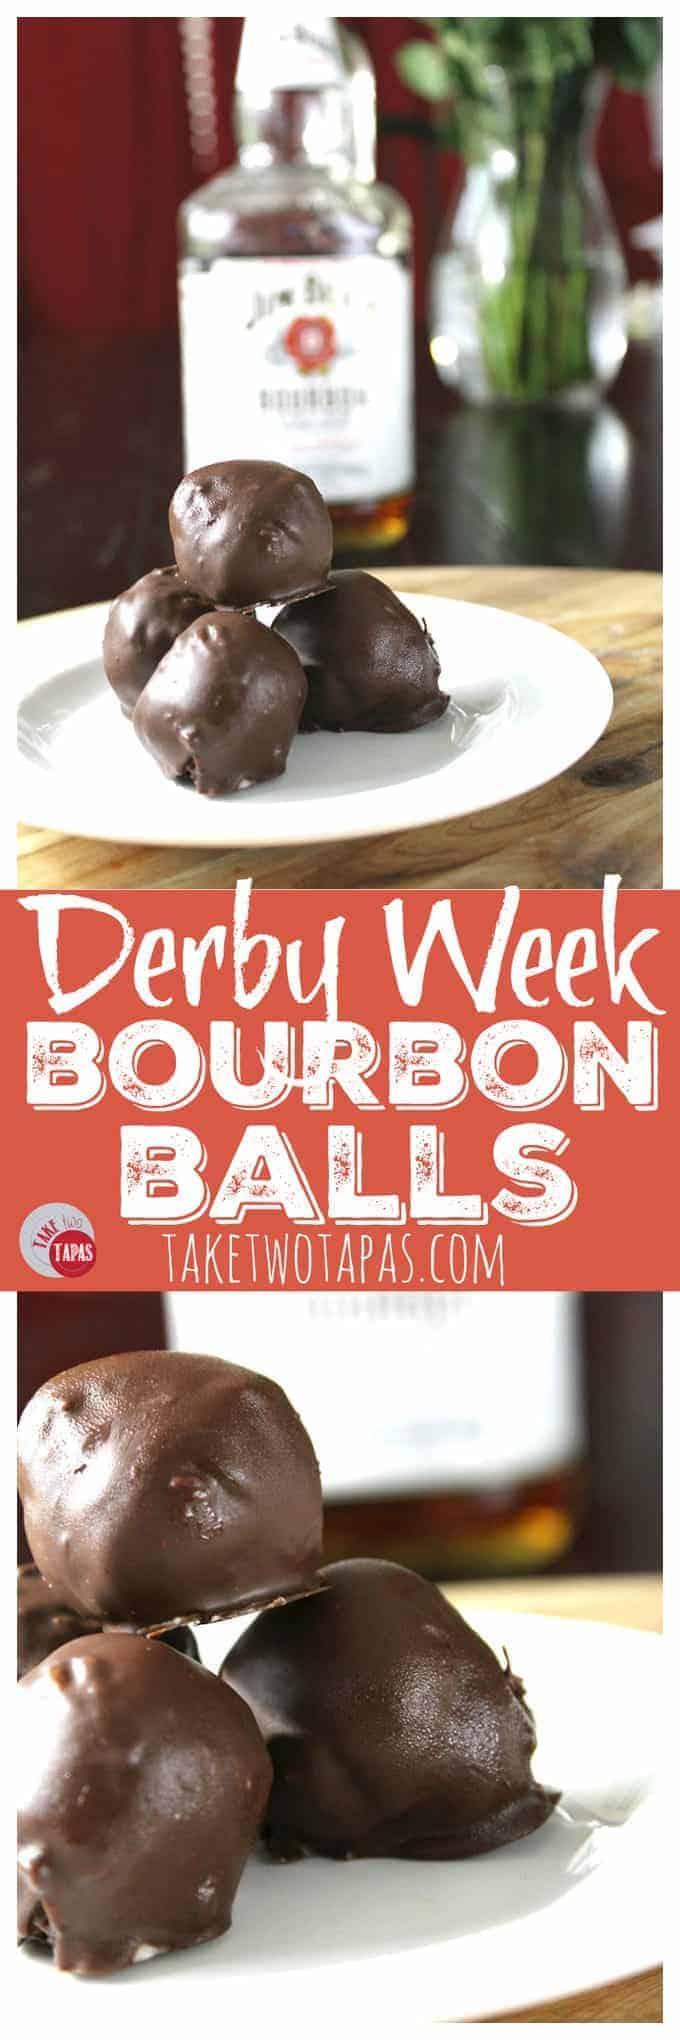 Derby Week Bourbon Balls | Take Two Tapas | #KentuckyDerby #BourbonBalls #bourbon #Truffles #Sweets